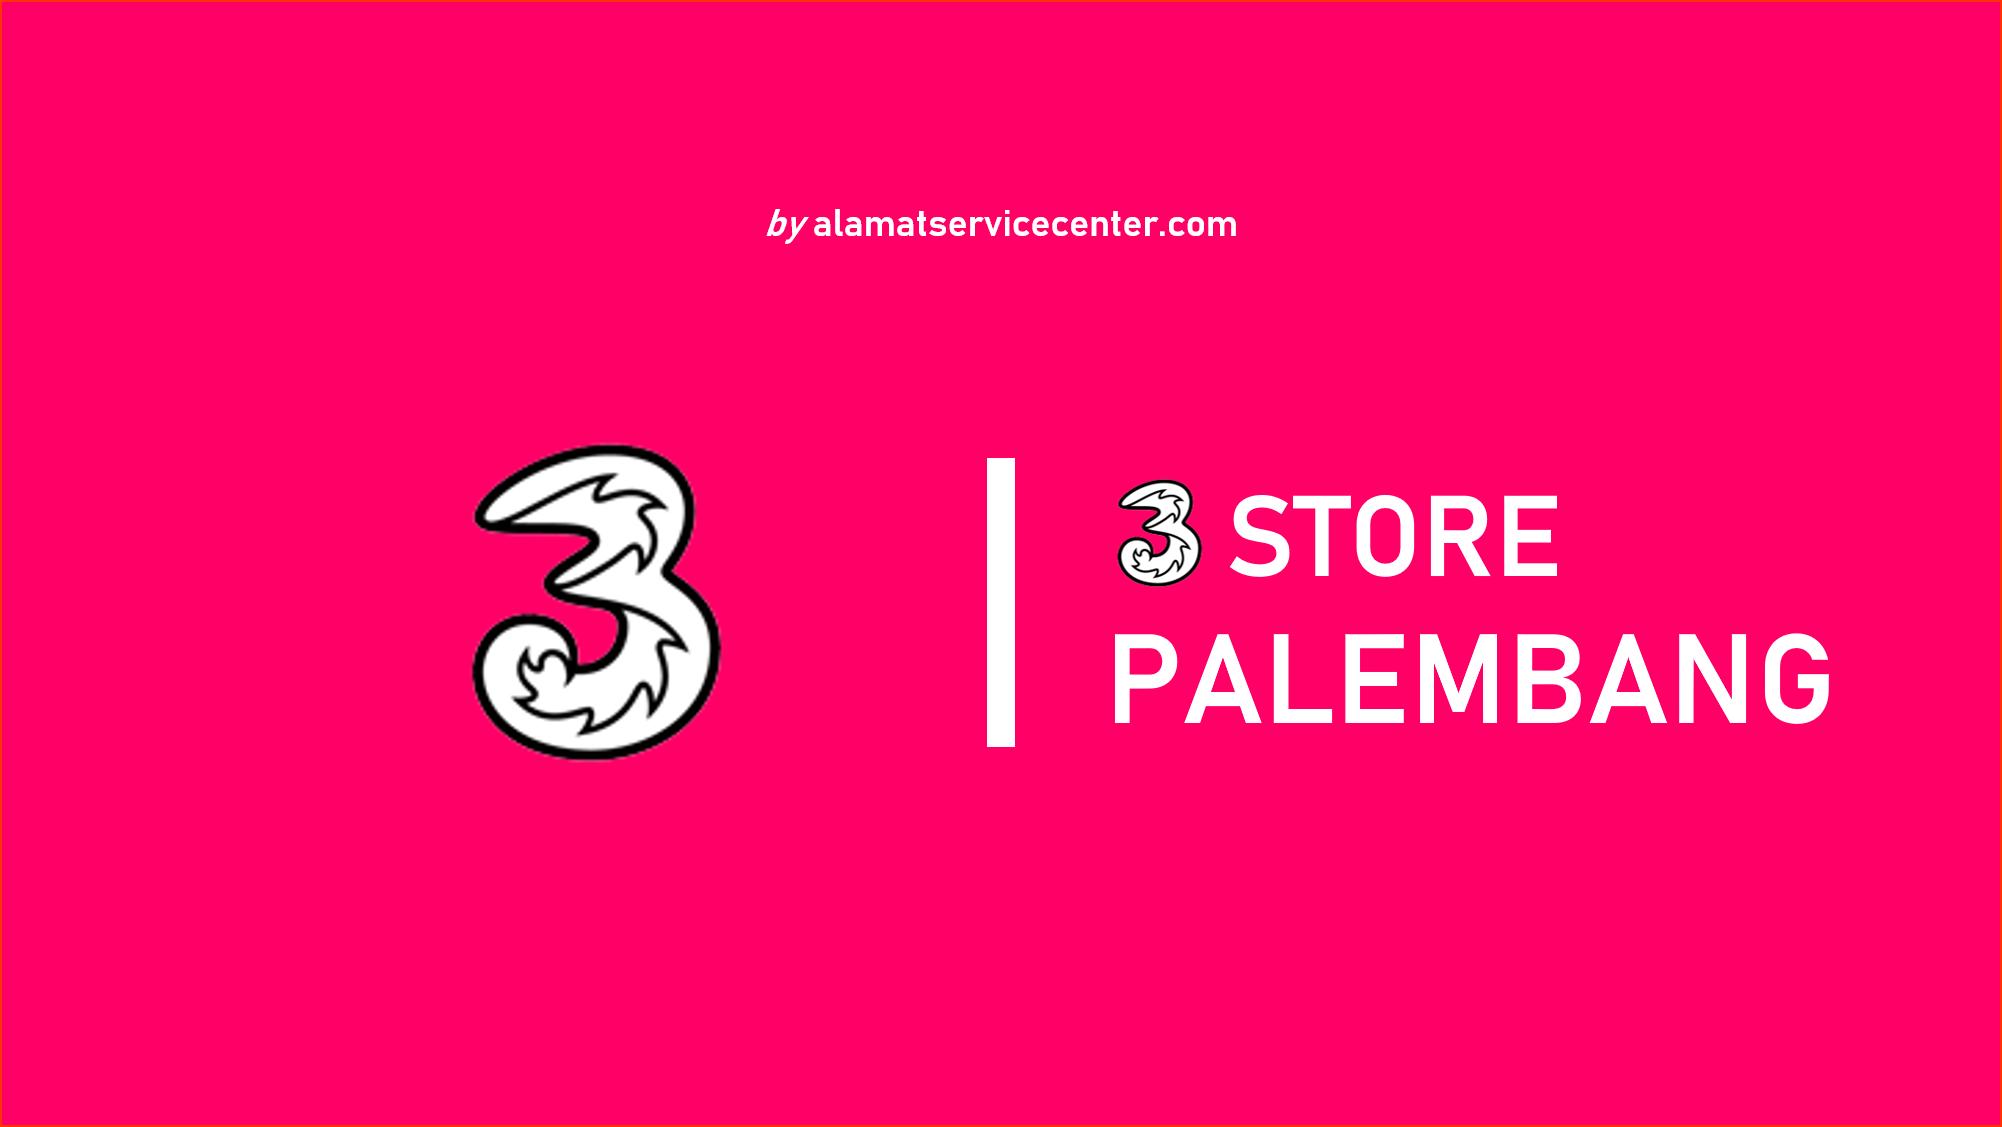 3 Store Palembang